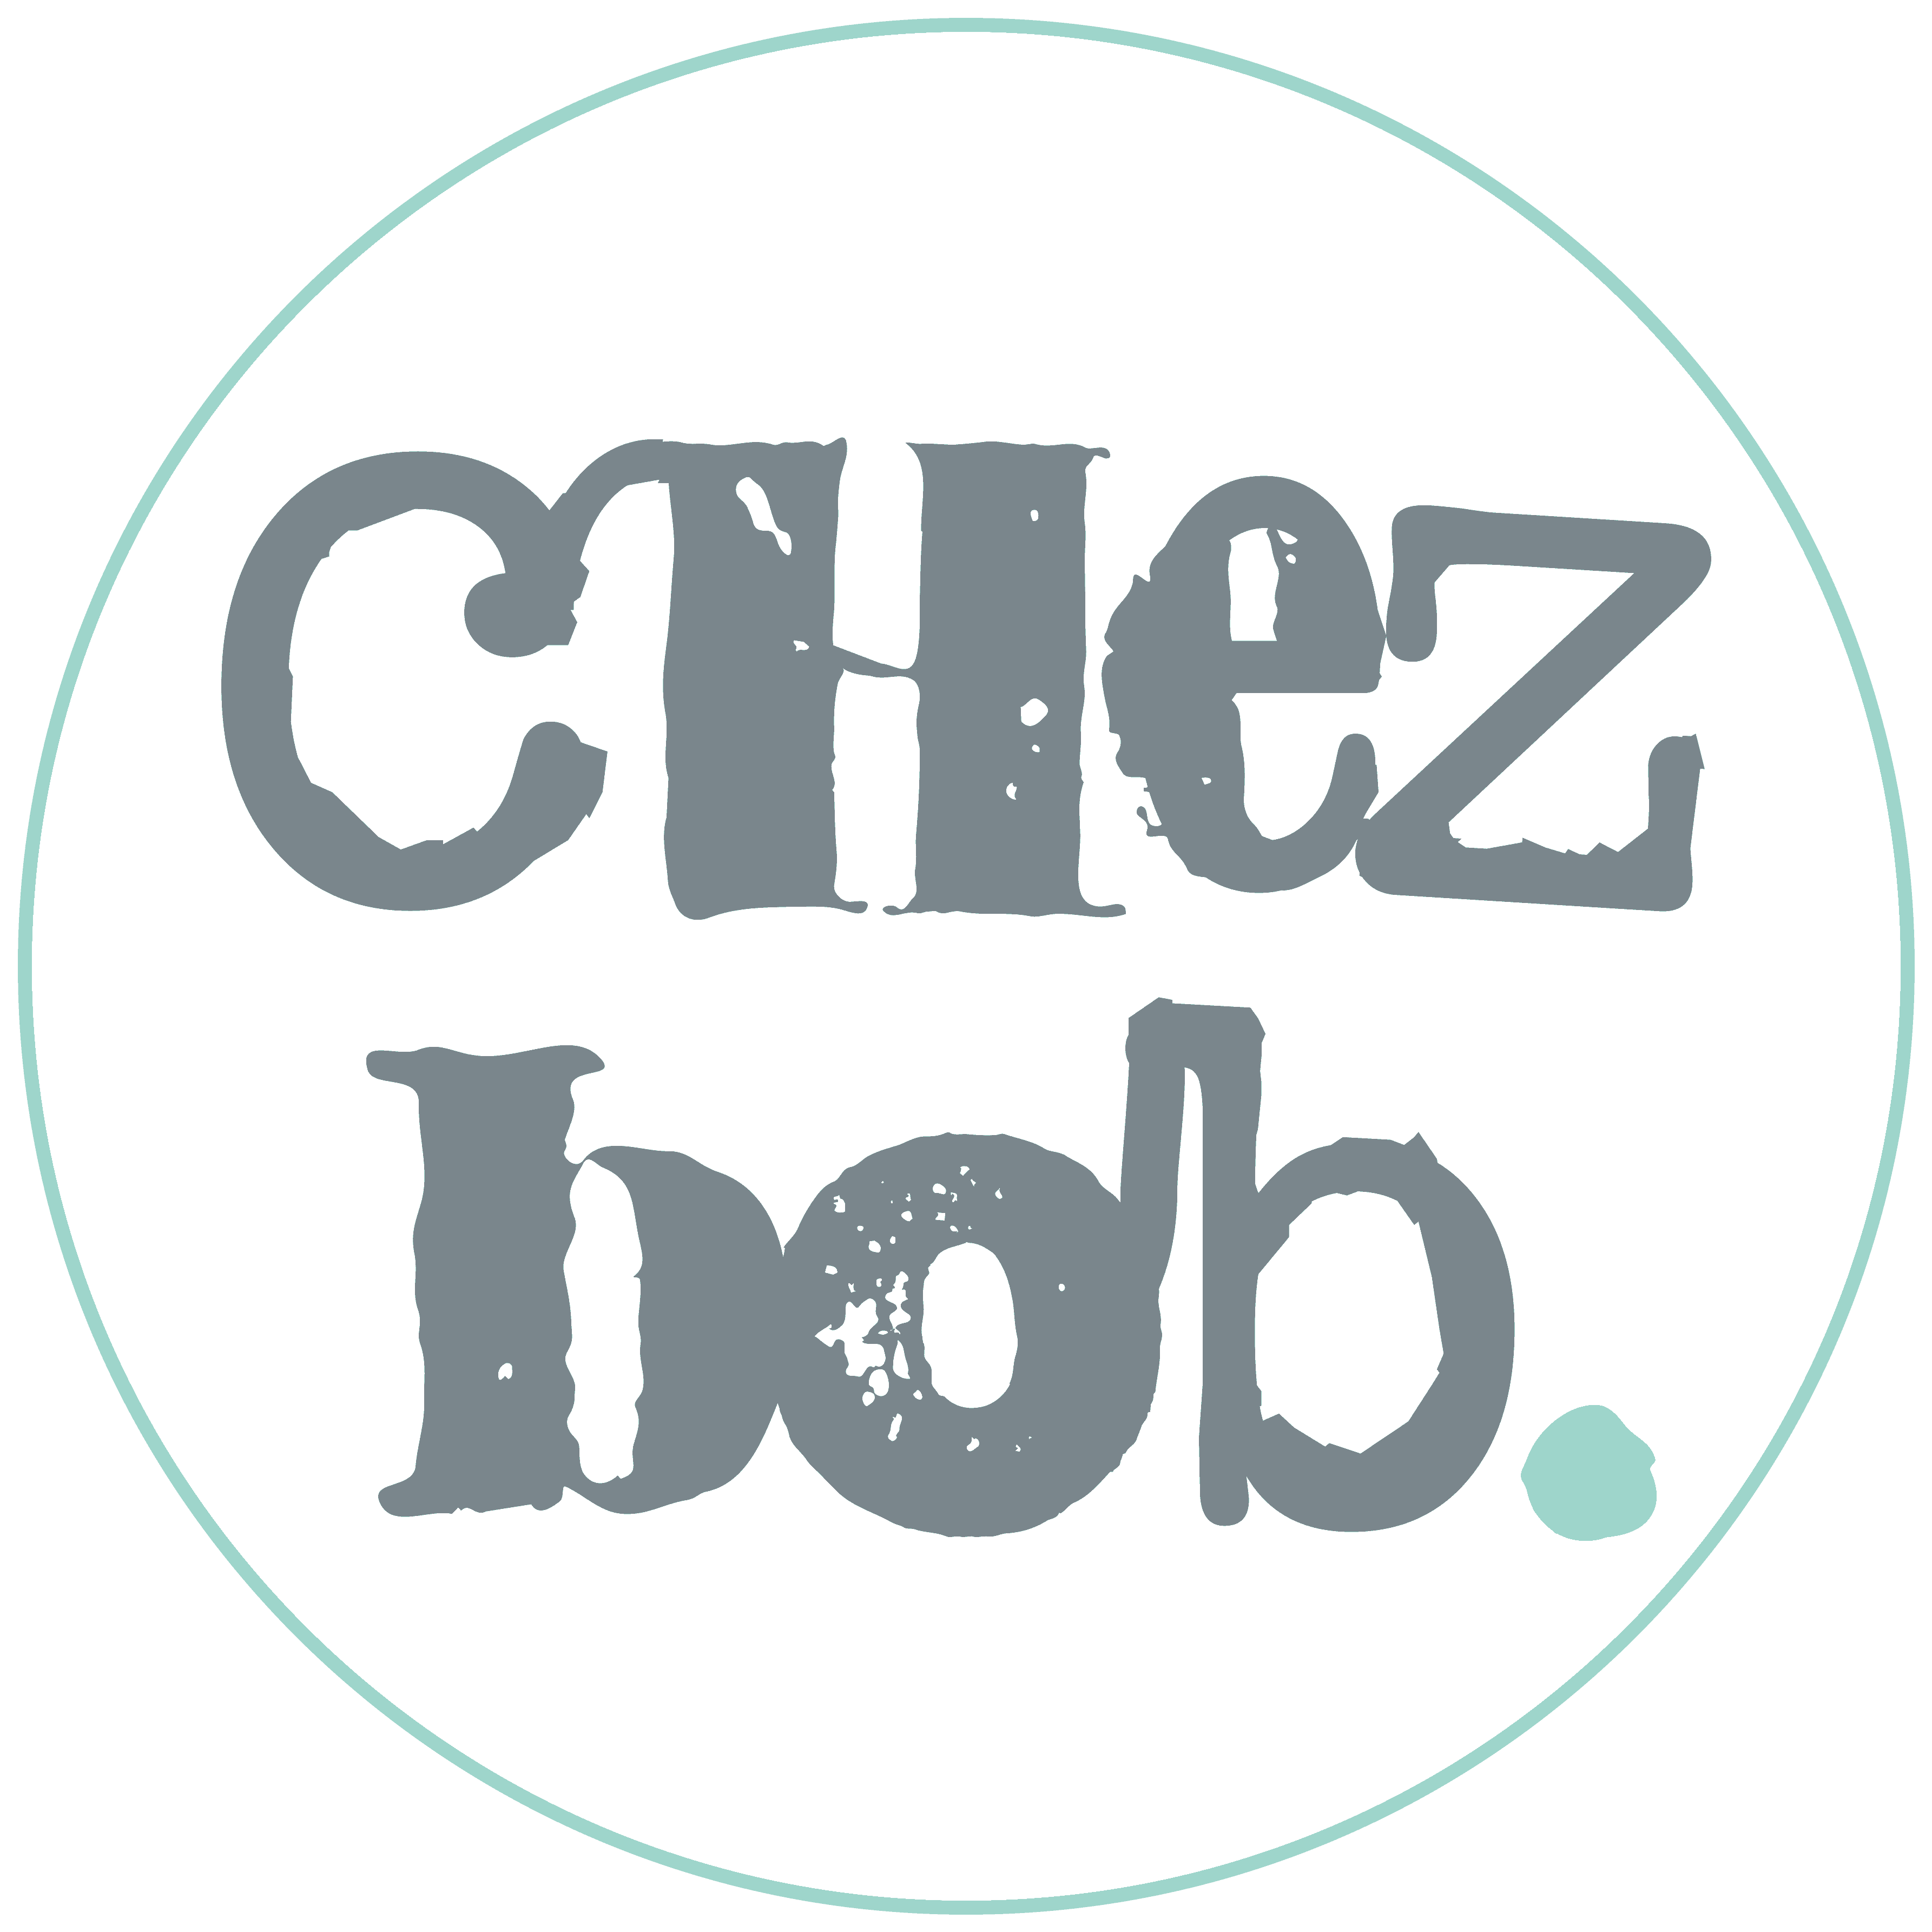 Chez Bob circle logo